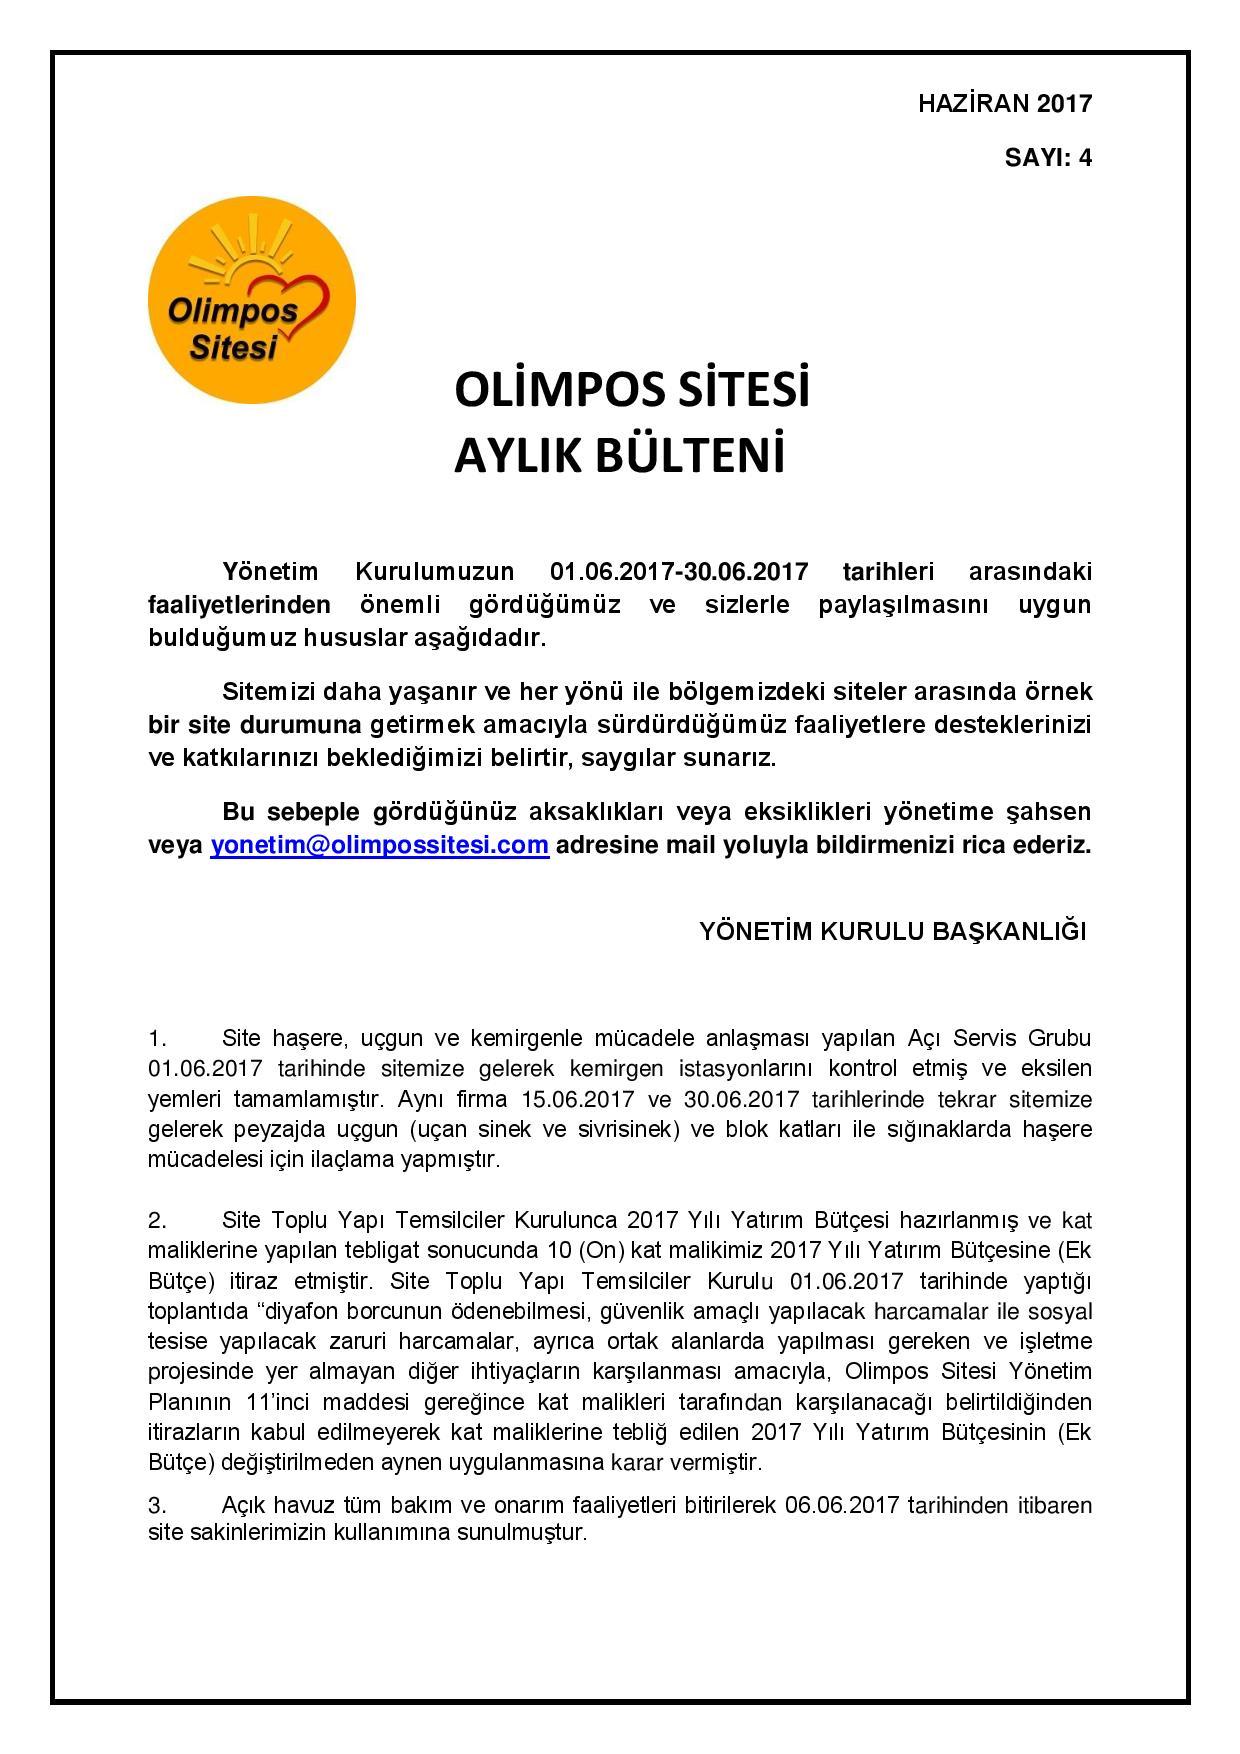 01.06.2017 HAZİRAN-2017 BÜLTEN 001